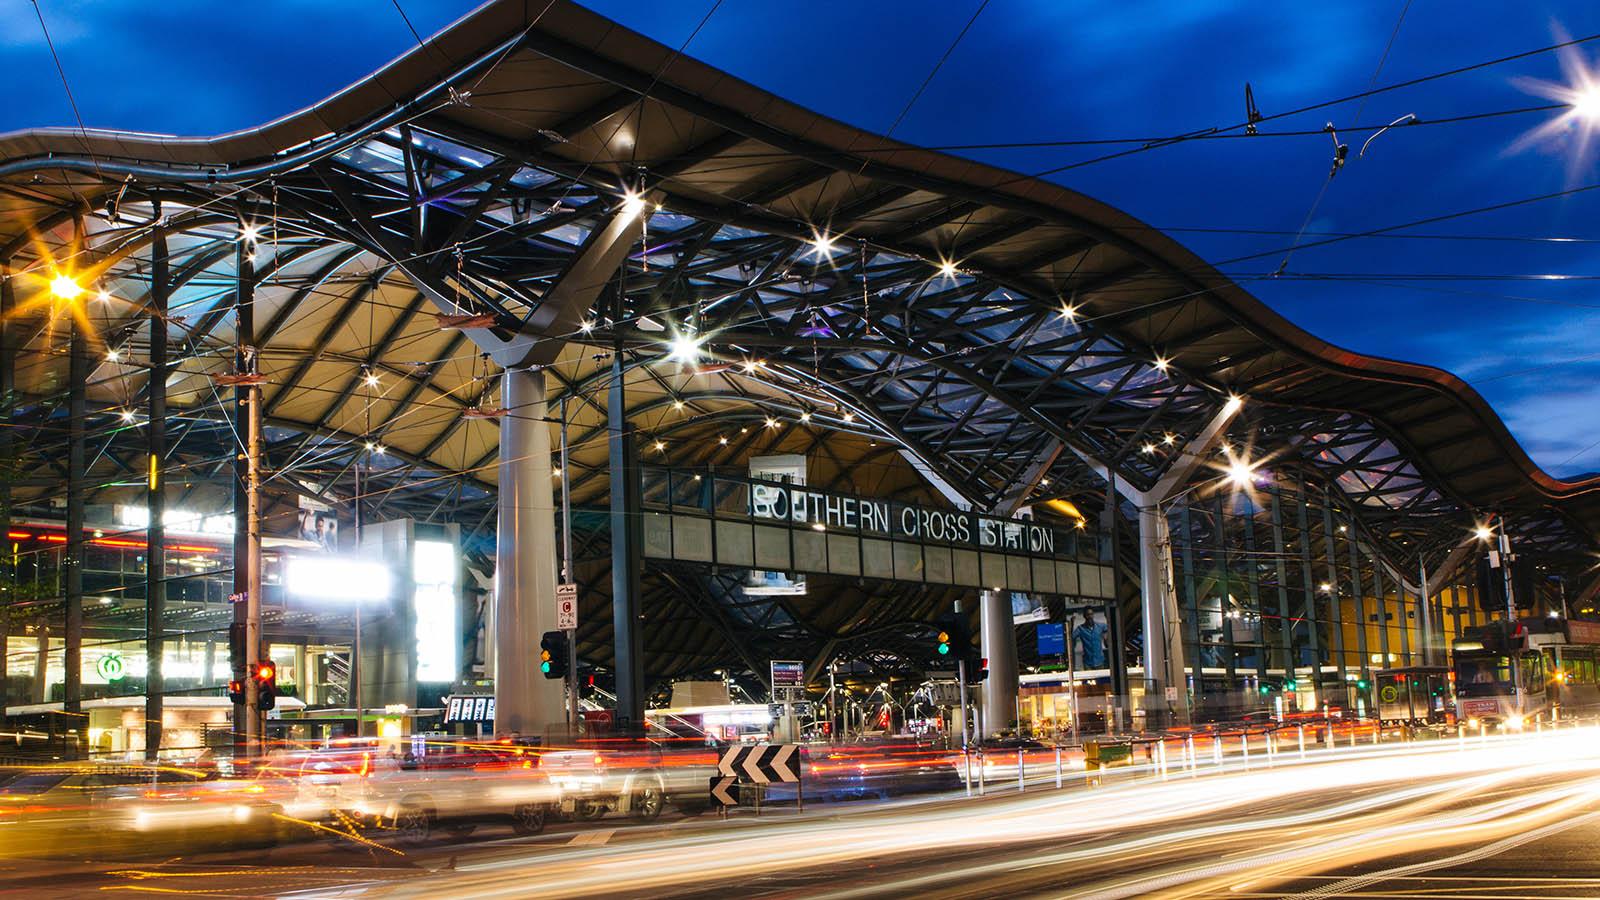 Southern Cross Station, Melbourne, Victoria, Australia